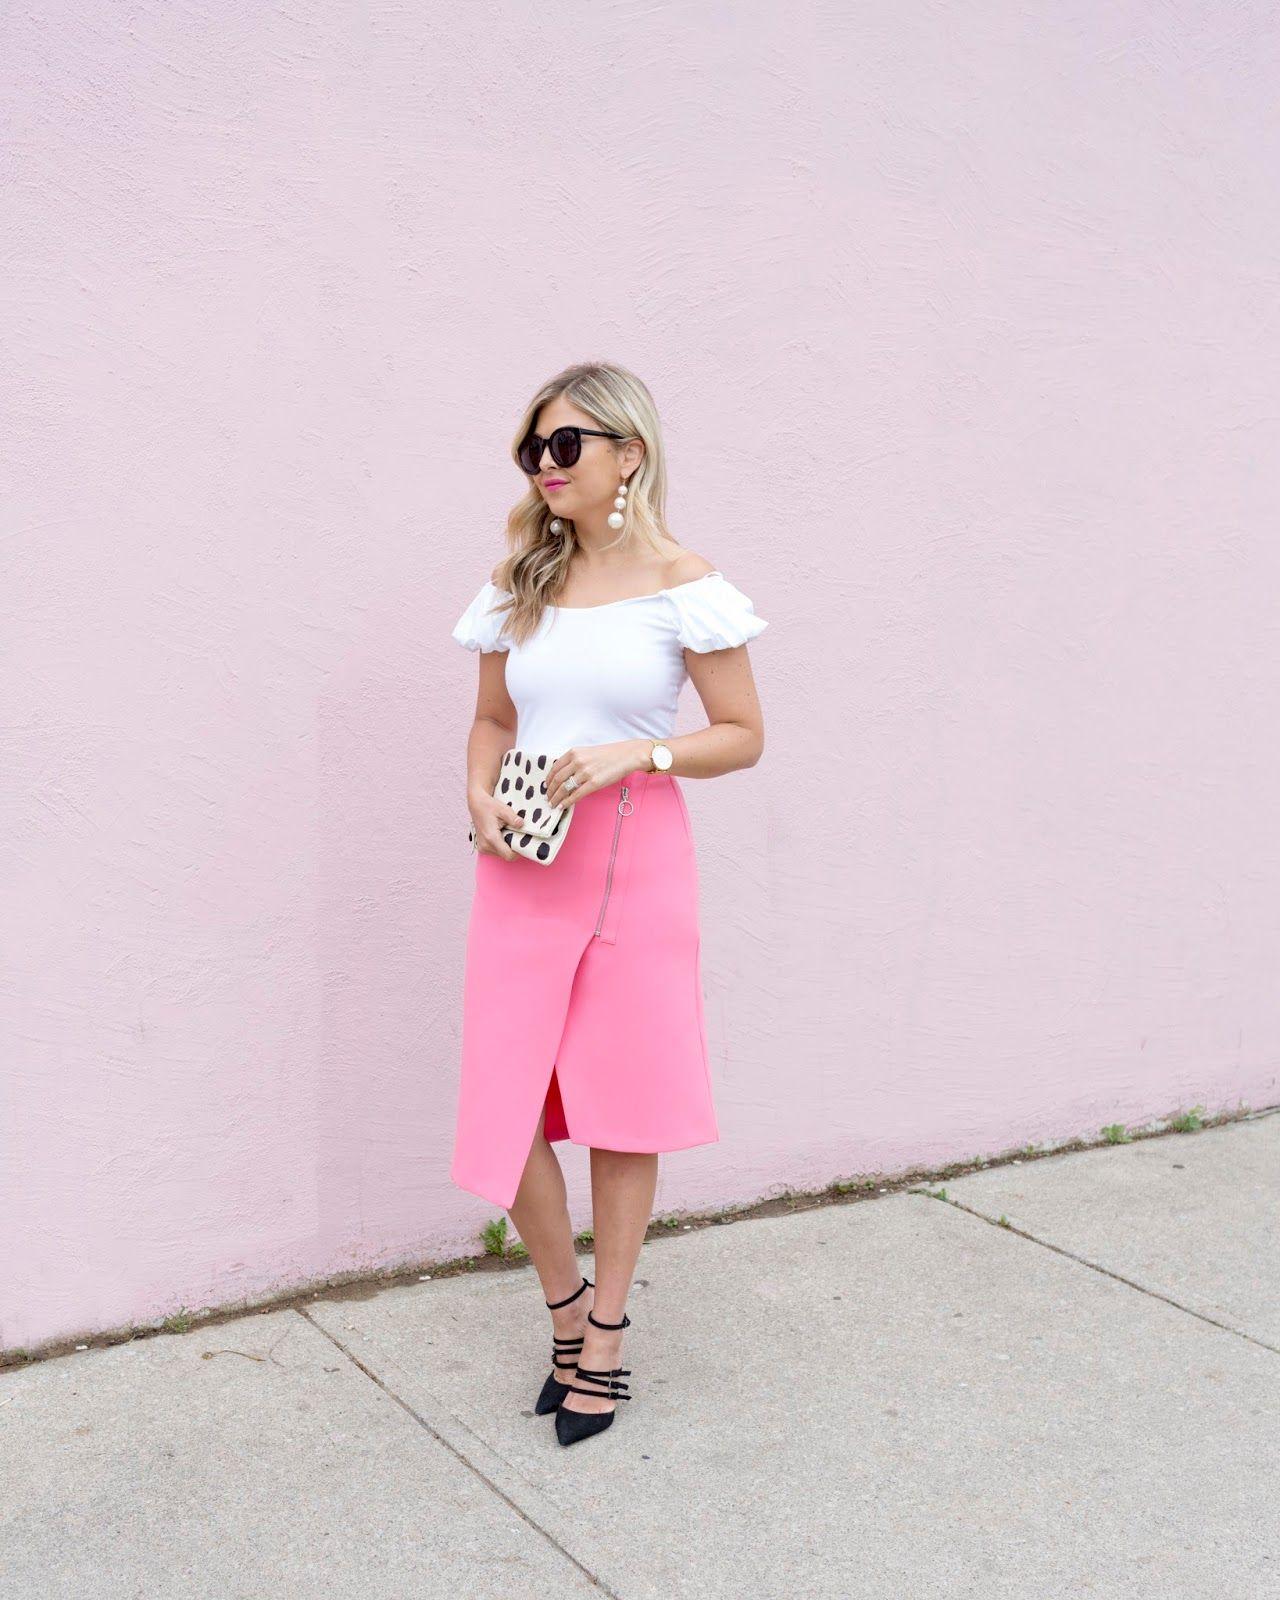 Toronto-based fashion and lifestyle blogger, Krystin writes about ...